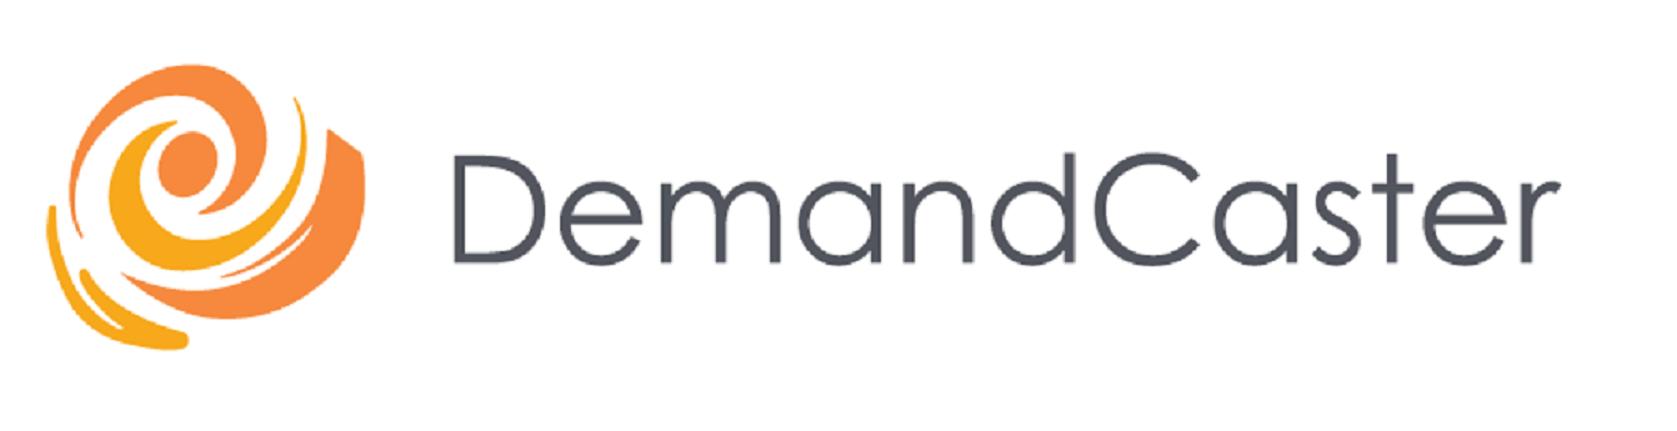 DemandCaster - DemandCaster Supply Chain Planning